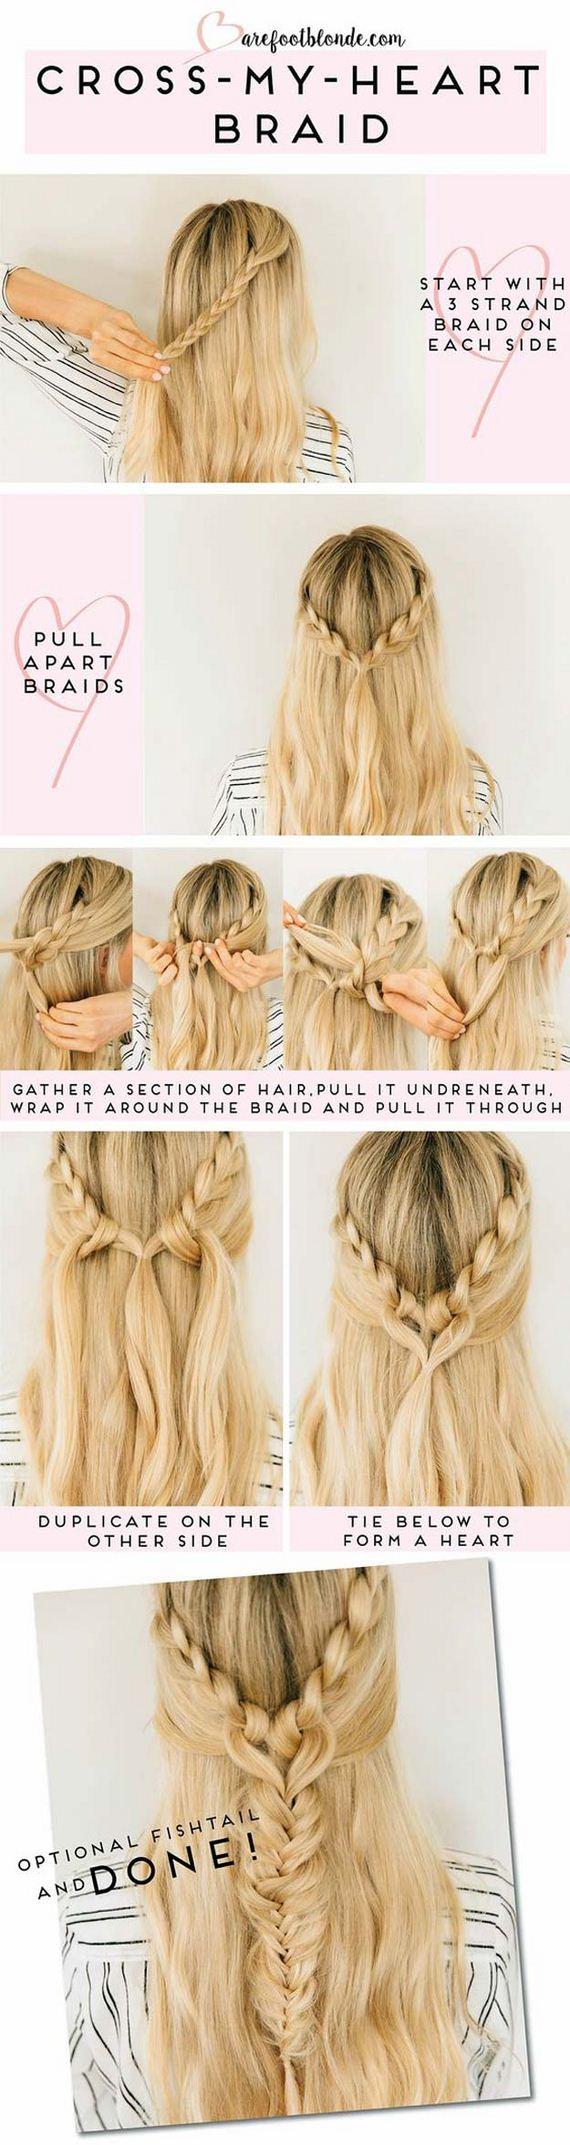 Swell The Best Cute Hair Braiding Tutorials Schematic Wiring Diagrams Amerangerunnerswayorg